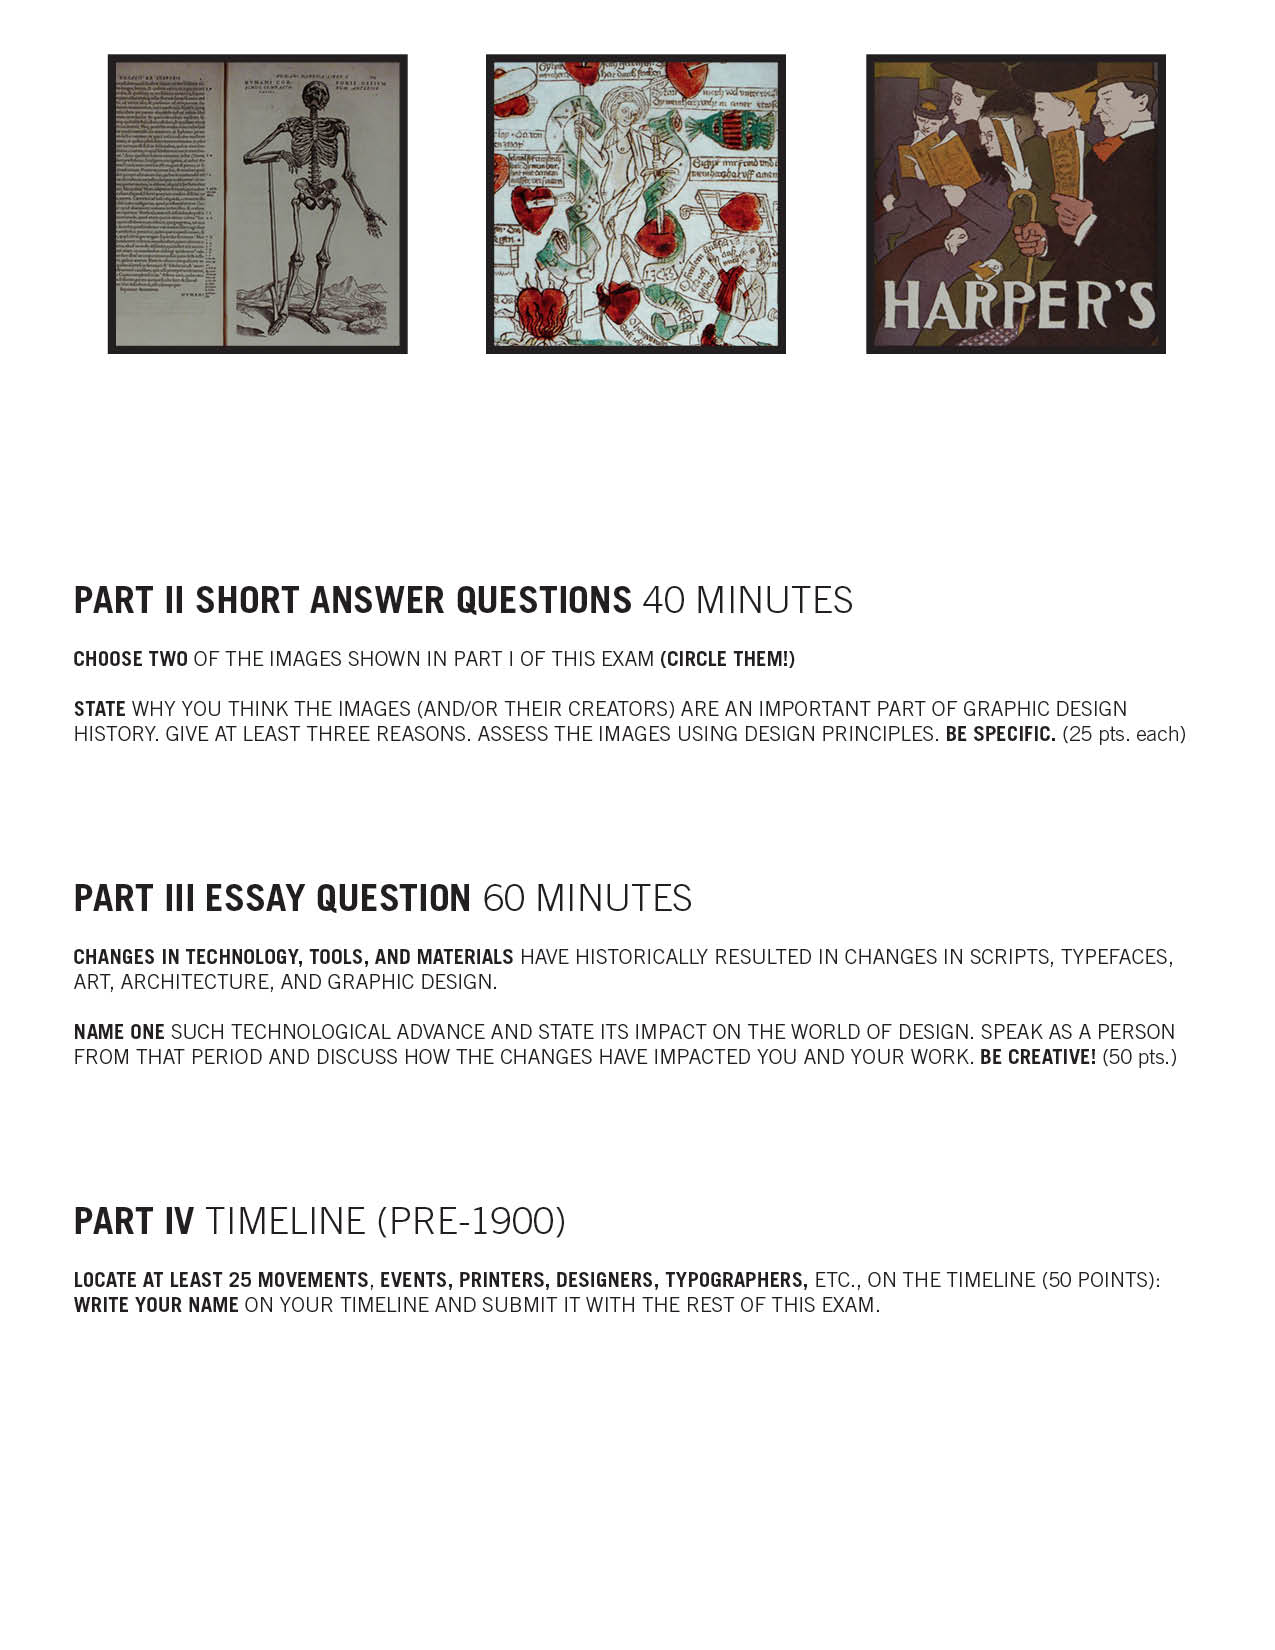 Graphic Design History At Ccsf